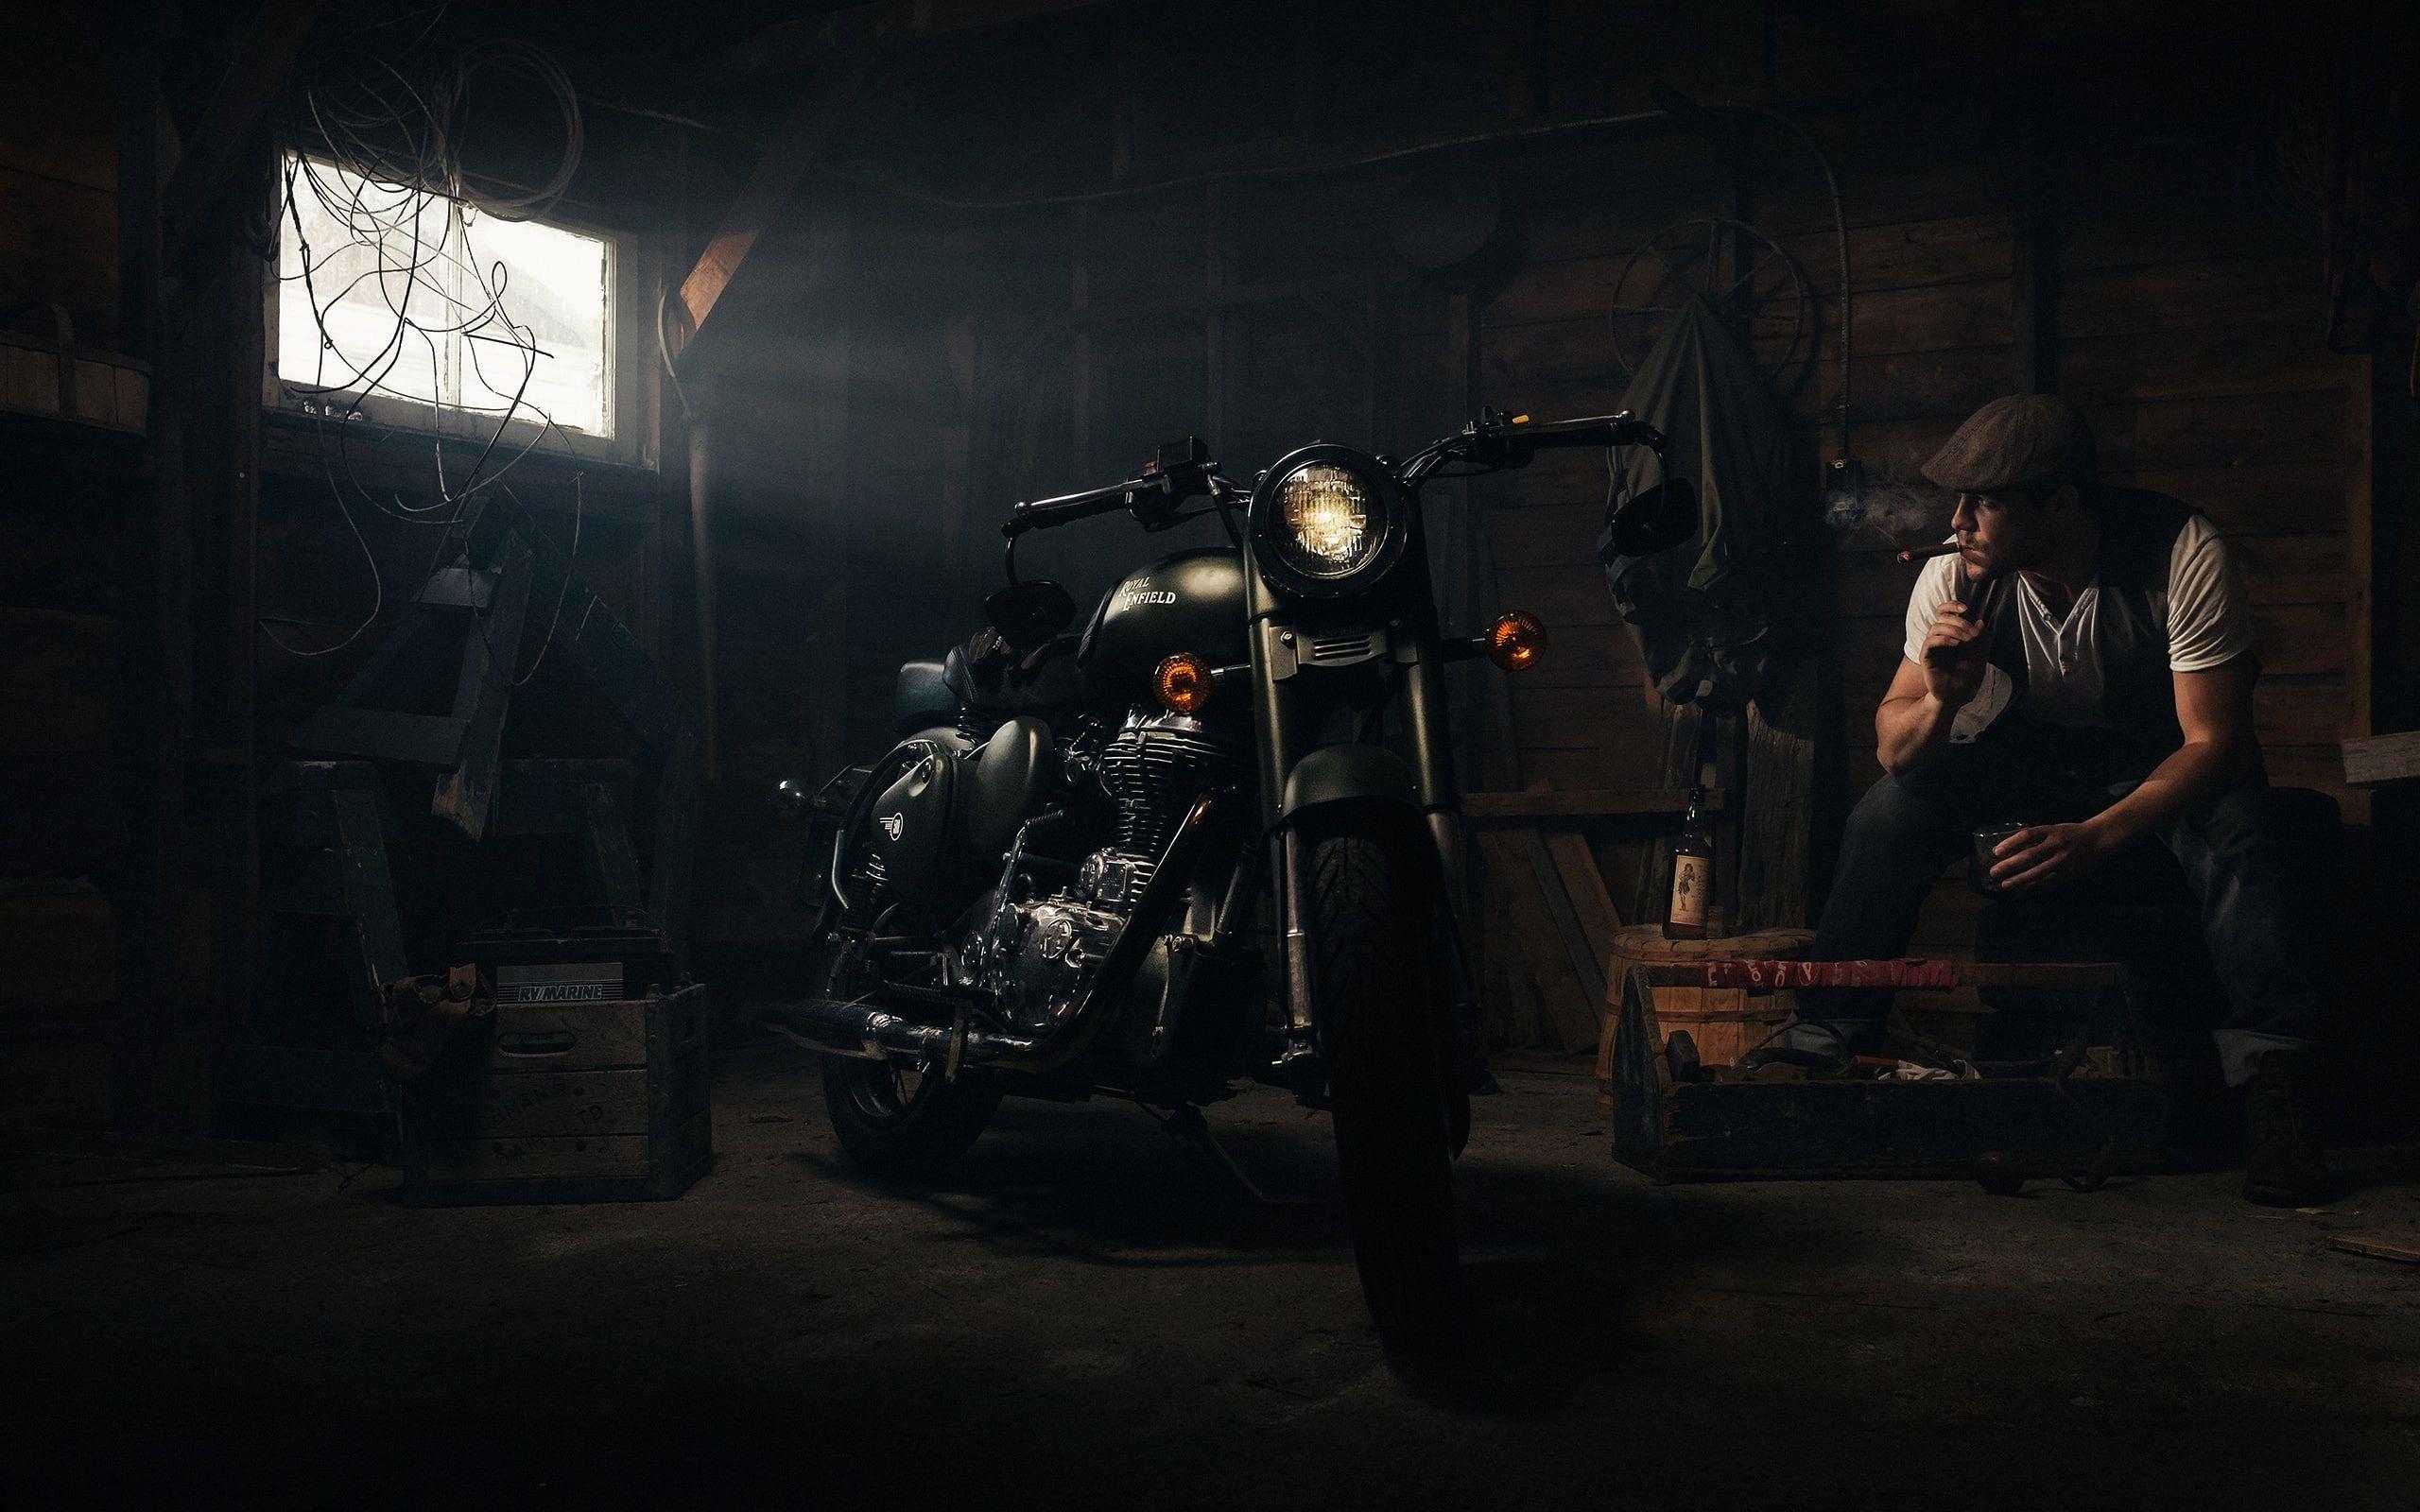 Hdwallpaper Motorcycle Wallpaper Enfield Desktop Cigar Royal